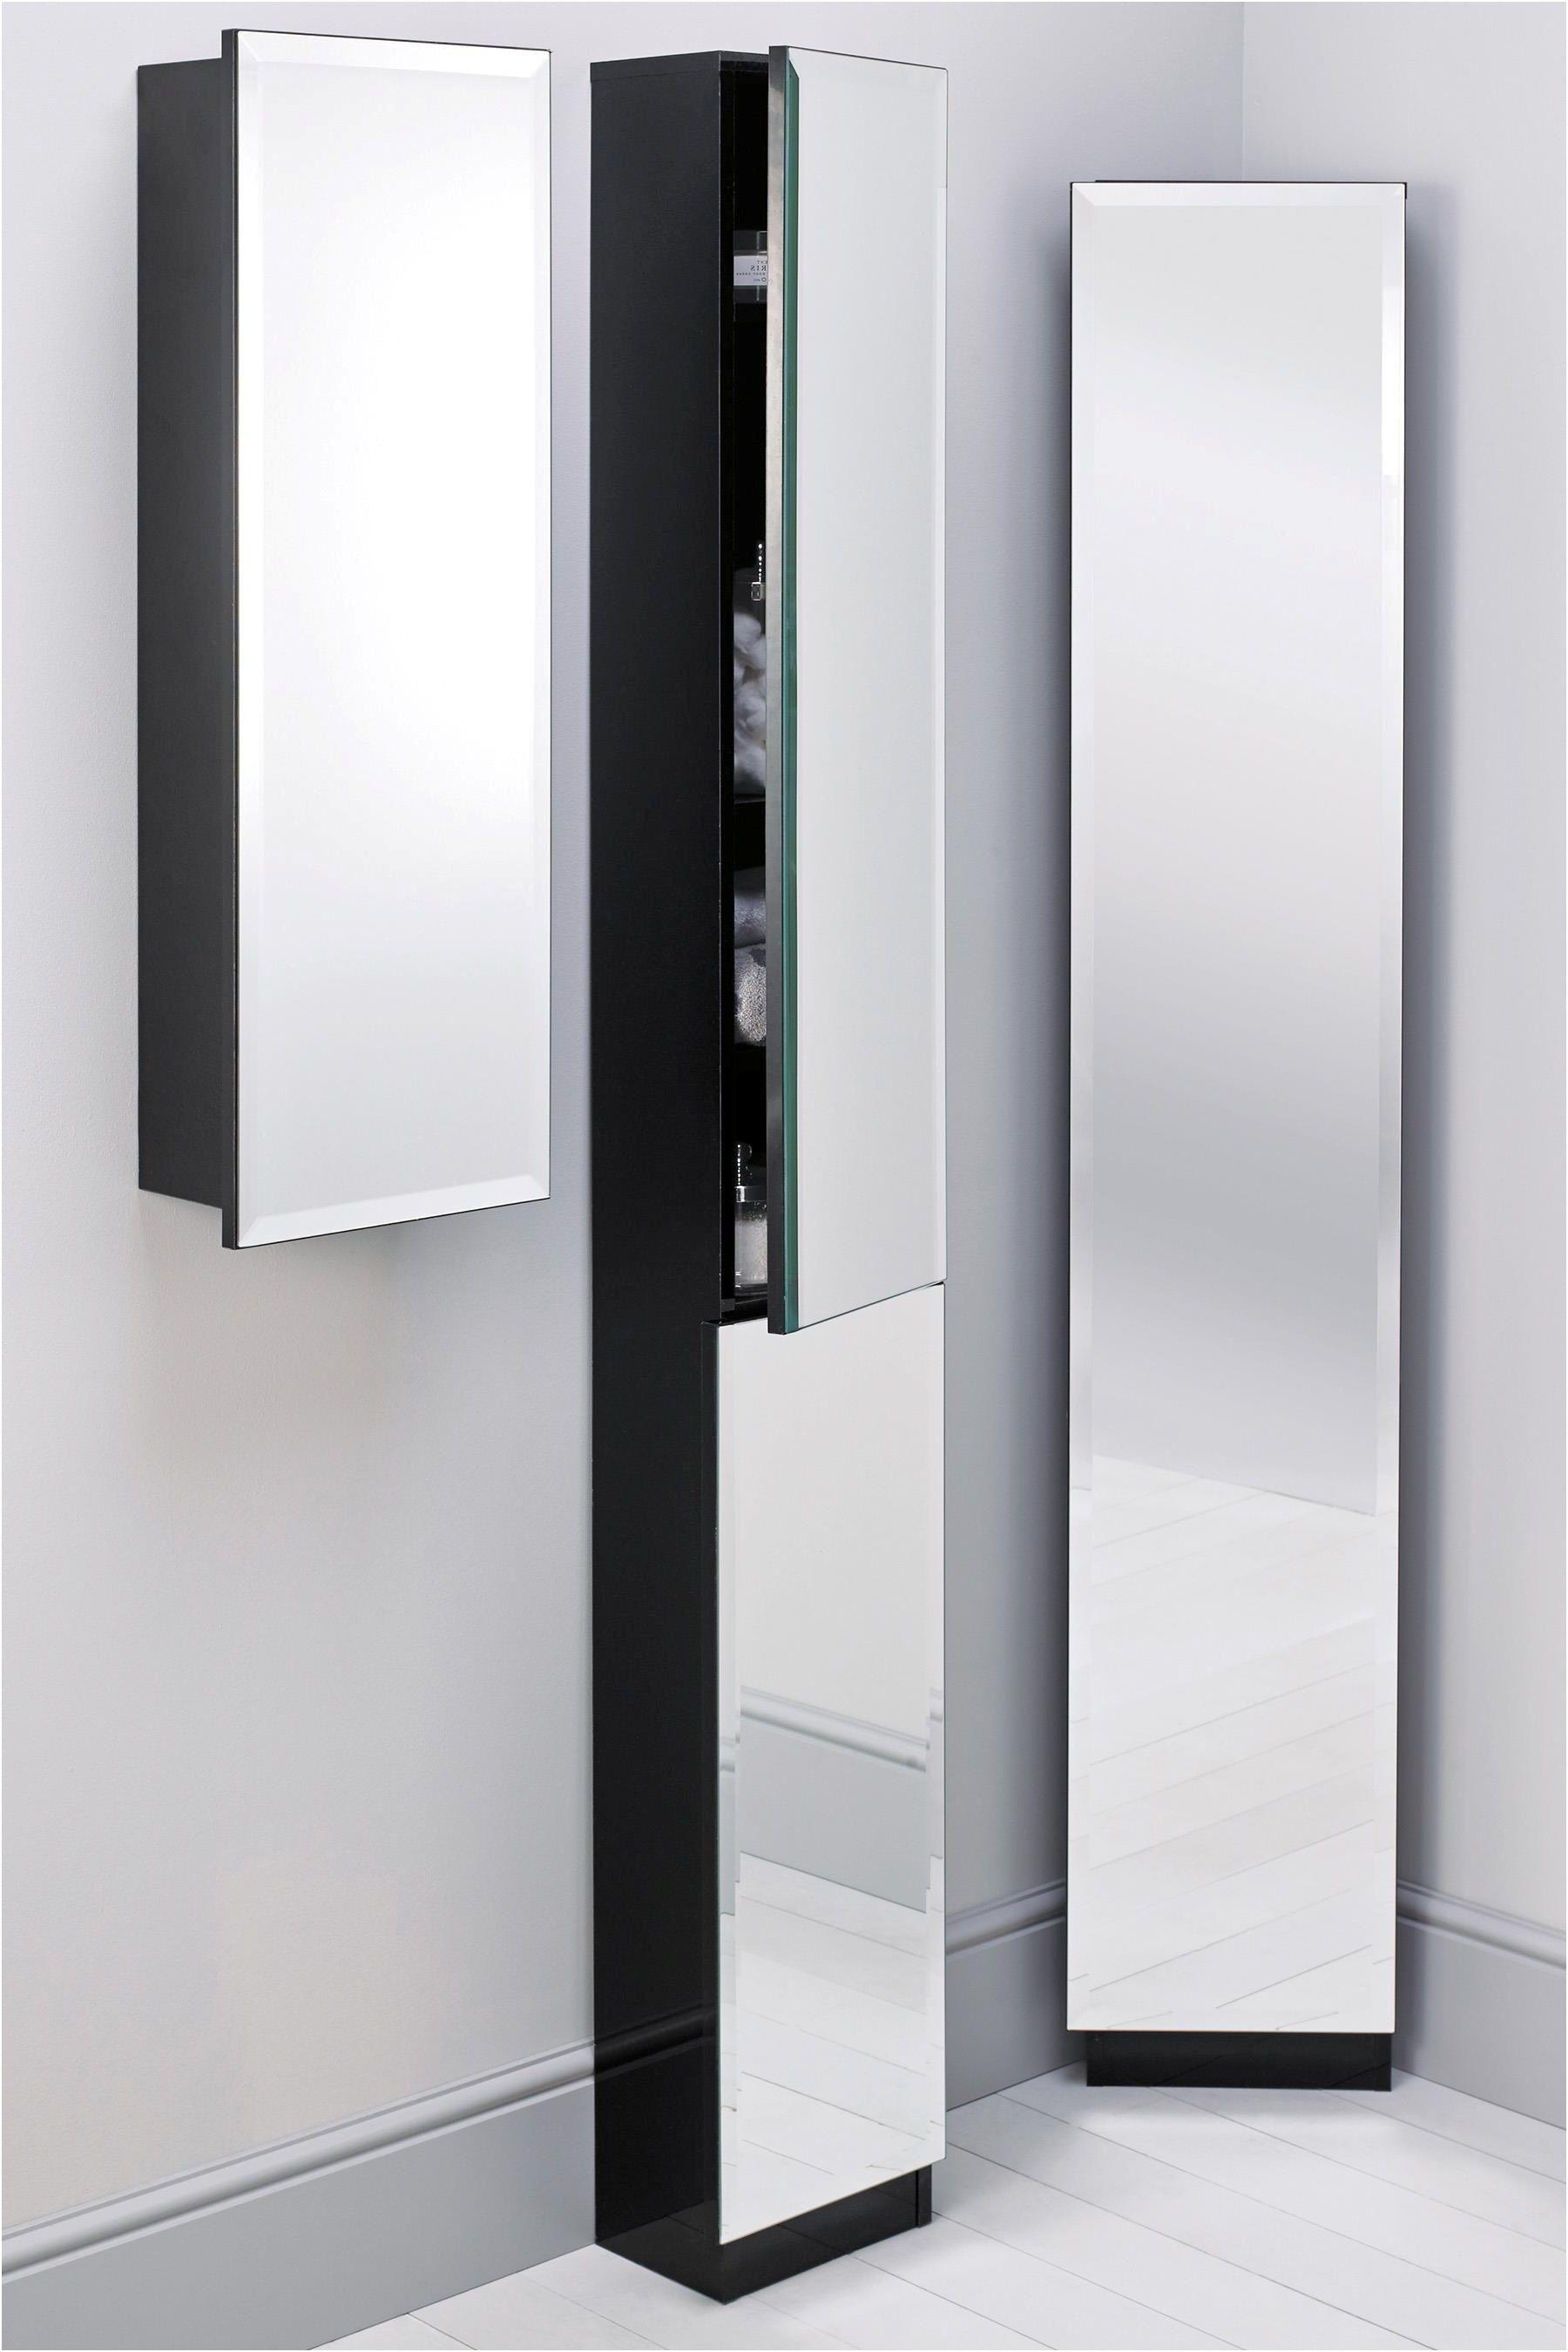 Tall Corner Bathroom Cabinet Bathroom Cabinets From Corner